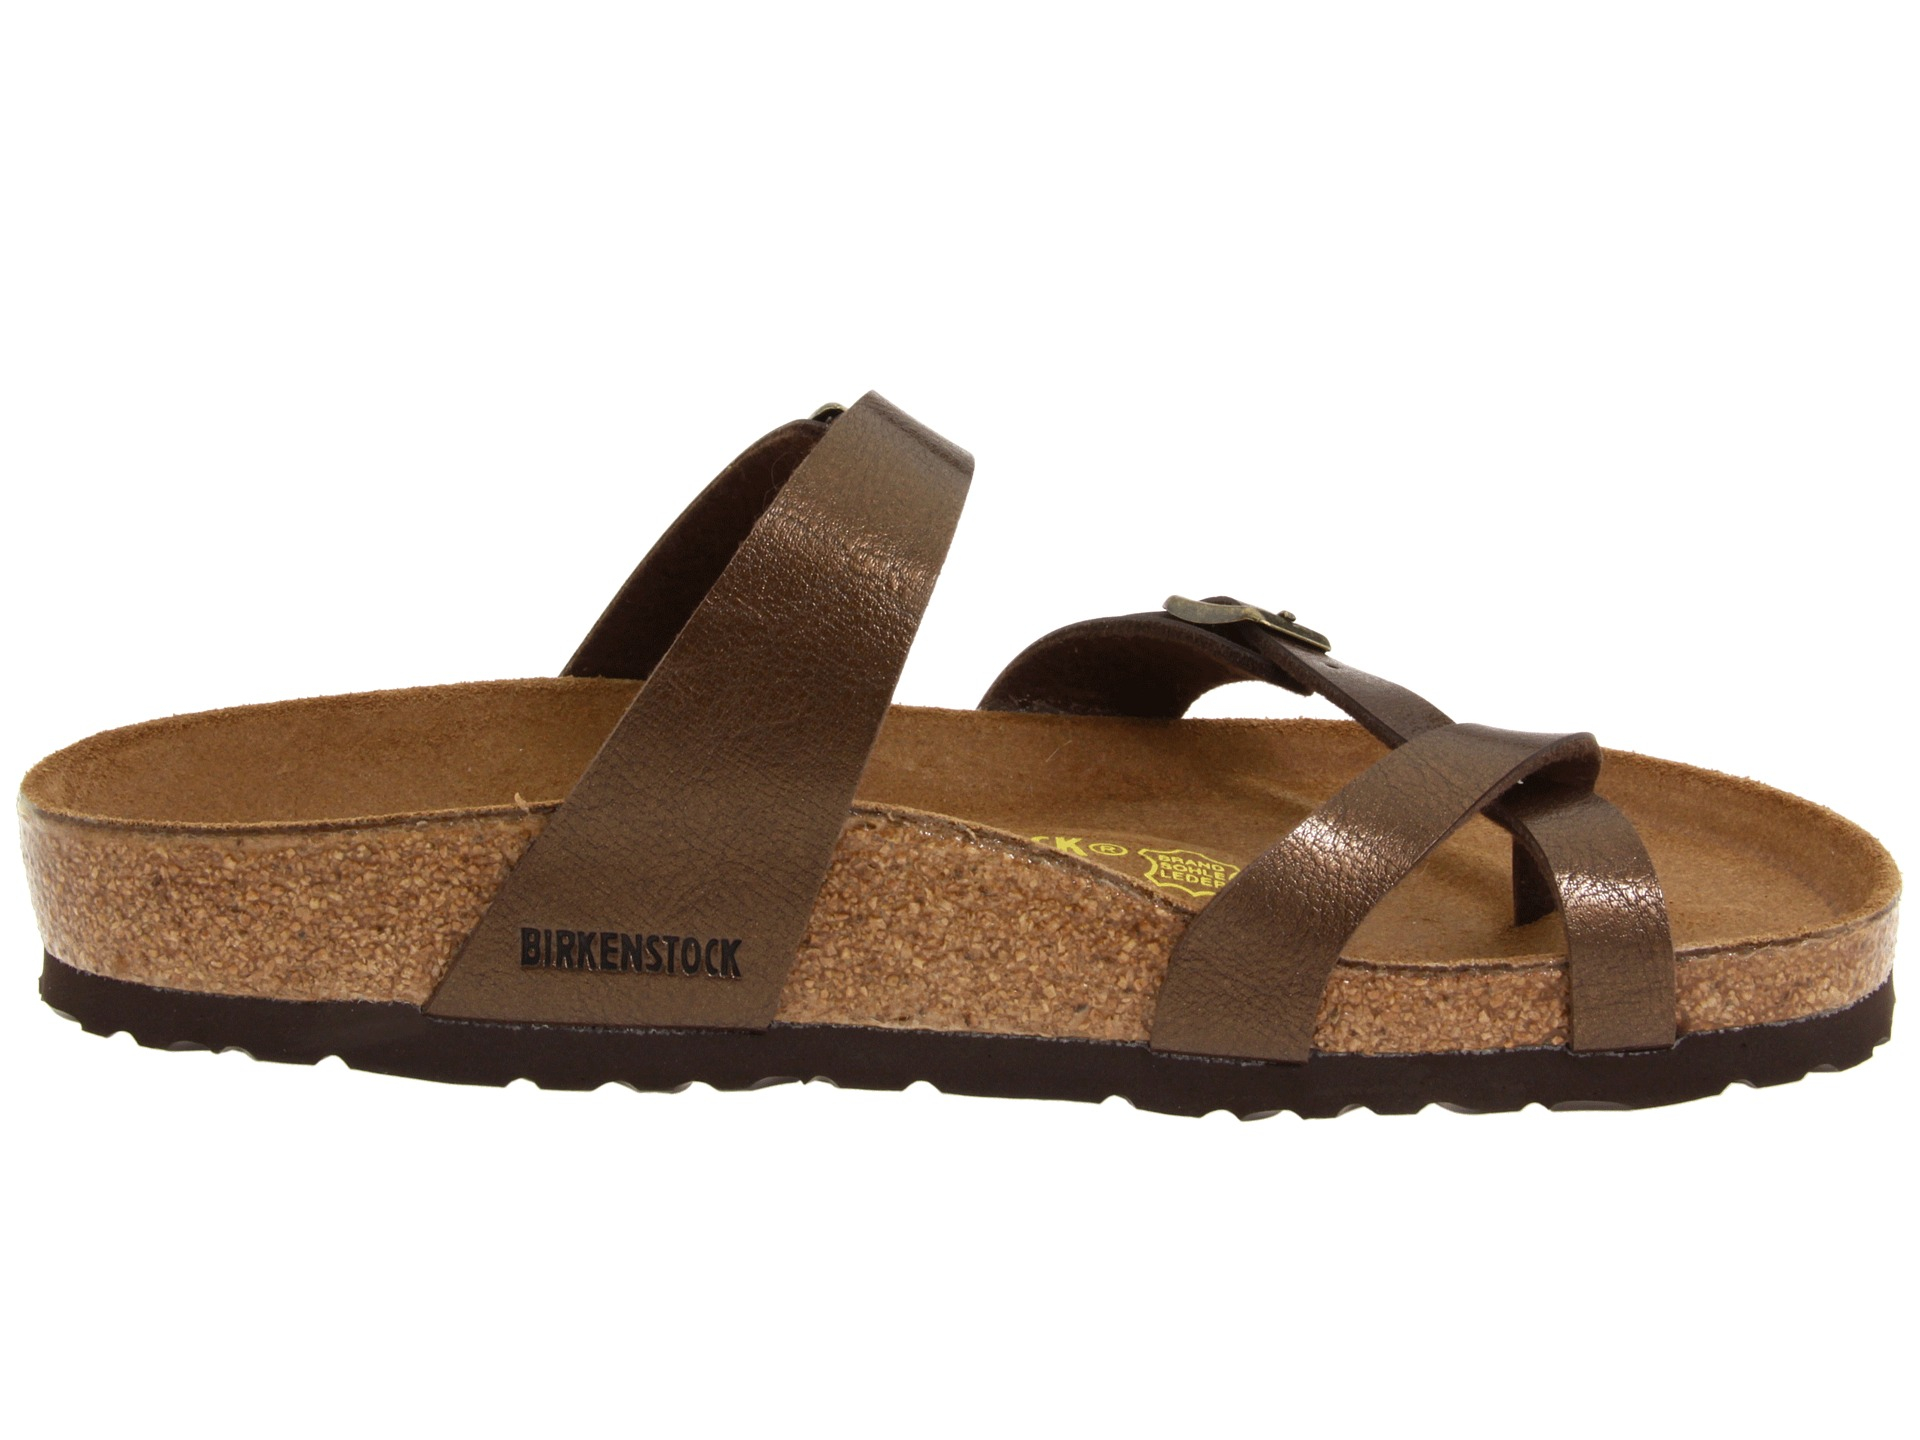 Birkenstock Mayari Cross Strap Sandals In Natural Mocha